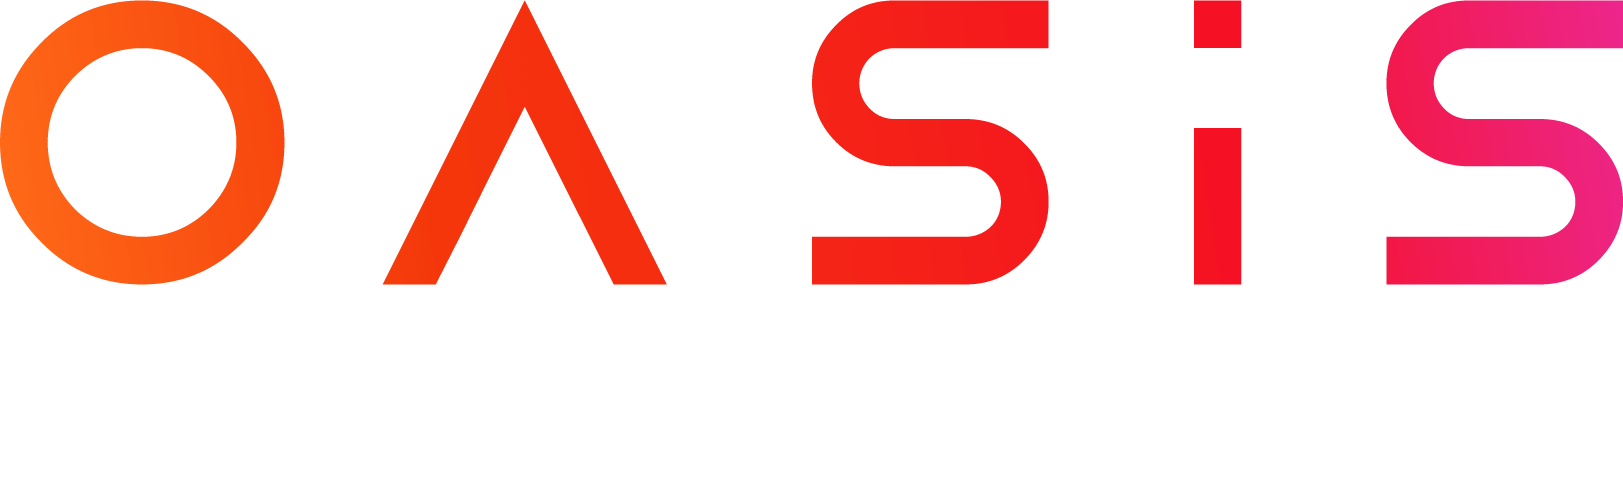 Oasis Building Design